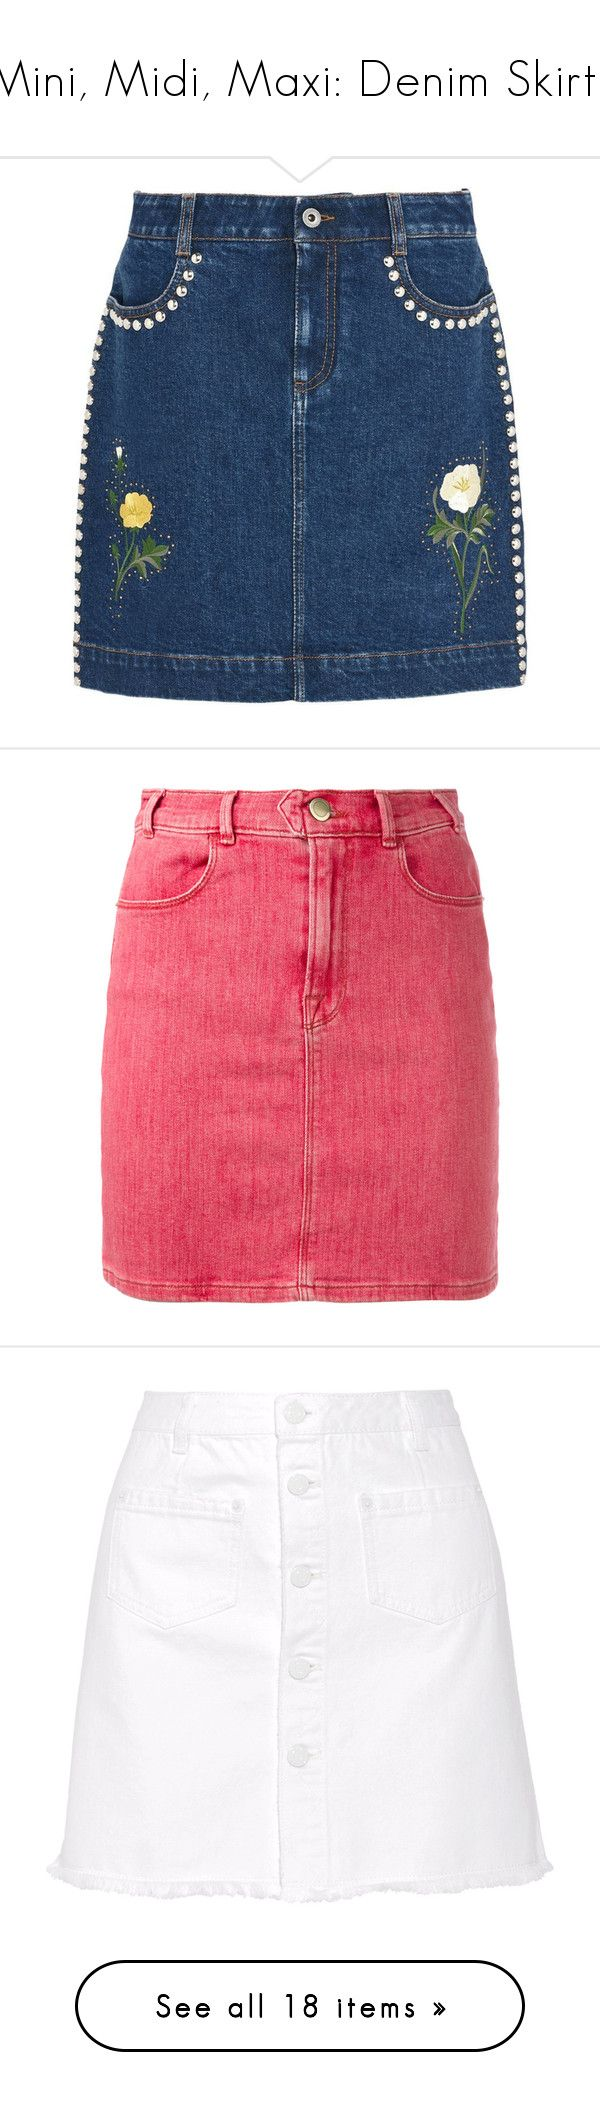 """Mini, Midi, Maxi: Denim Skirts"" by polyvore-editorial ❤ liked on Polyvore featuring denimskirts, skirts, mini skirts, bottoms, denim, midnight, embroidered skirt, blue skirt, studded mini skirt and stella mccartney"